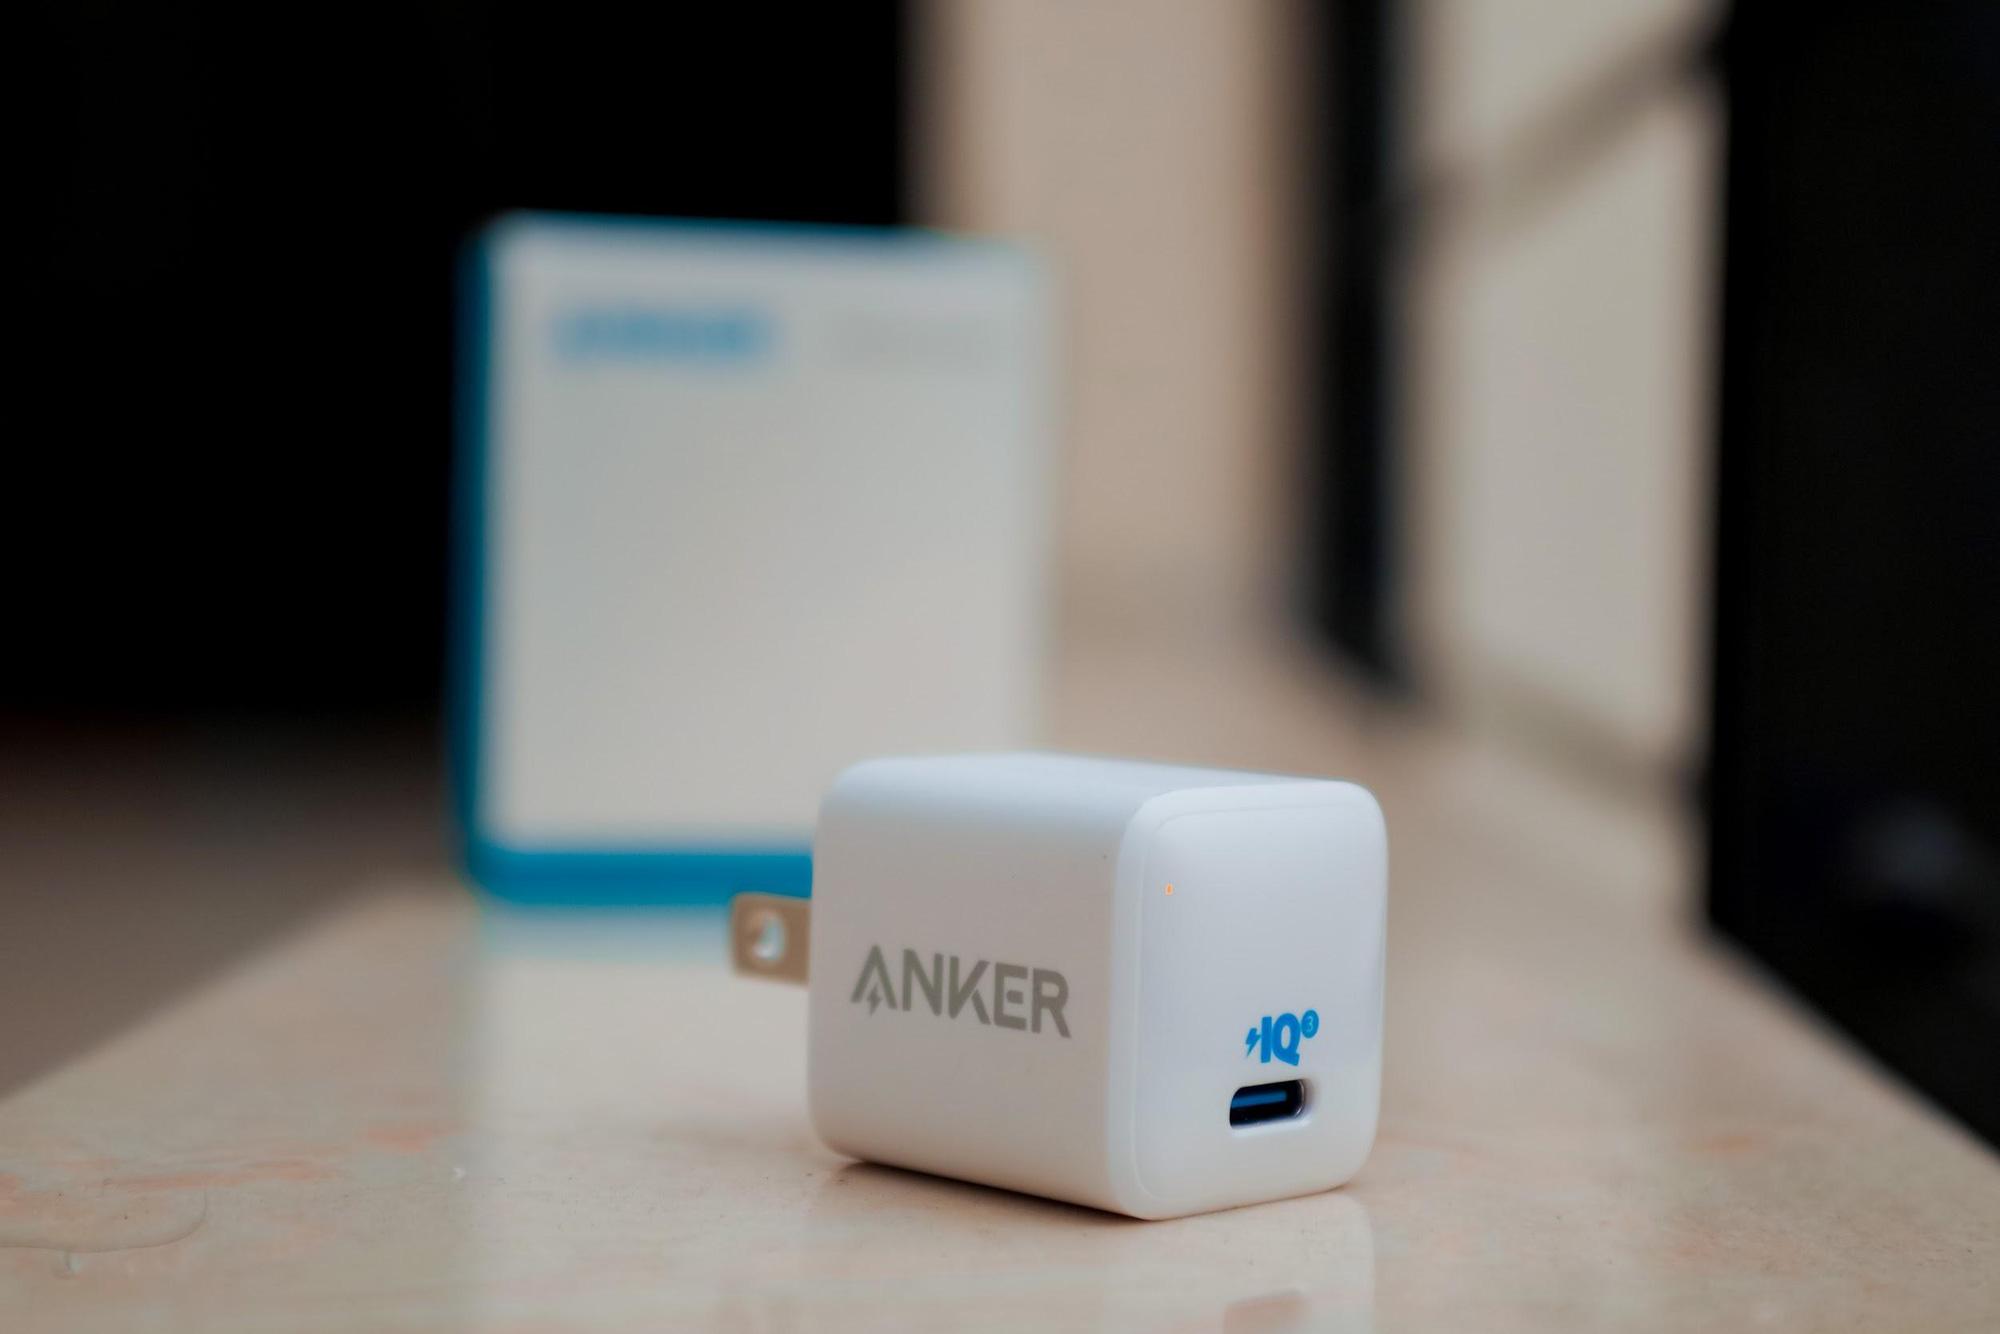 Combo sạc cáp siêu nhỏ gọn Anker PowerPort III Nano và PowerLine III - Ảnh 1.